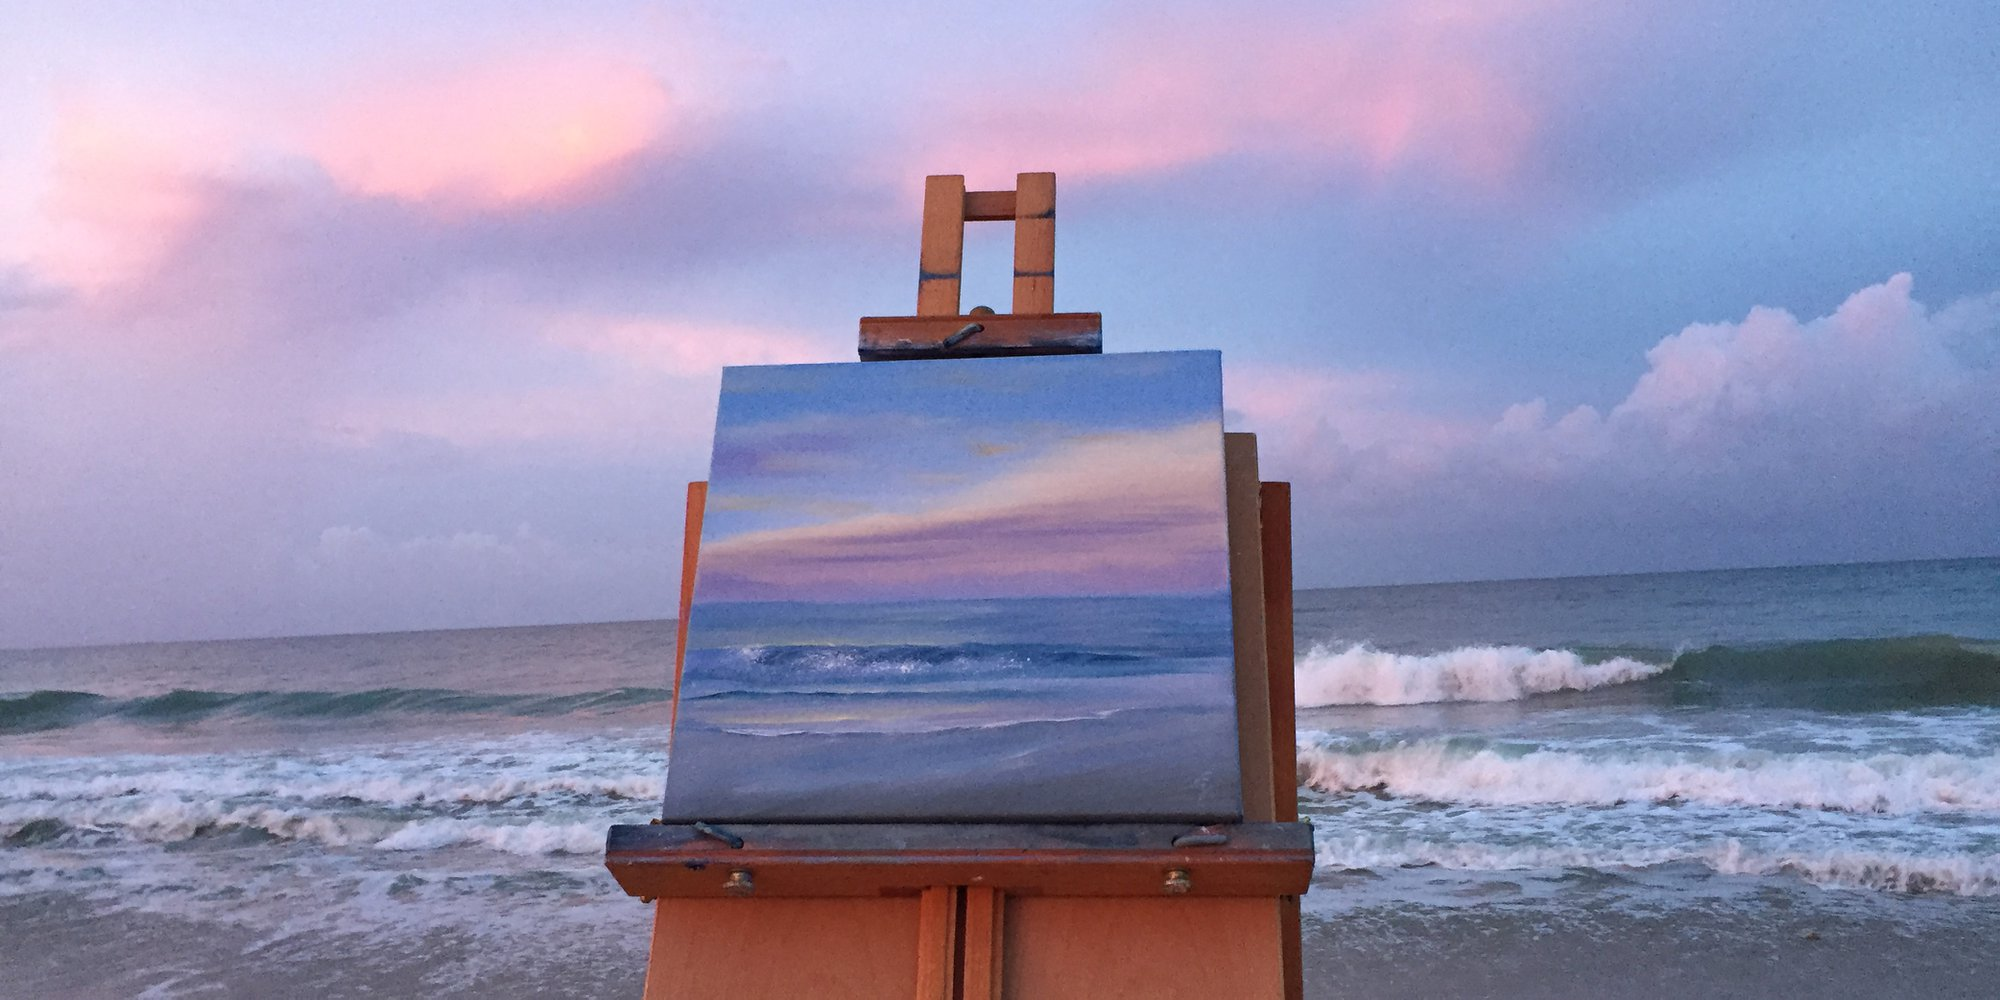 Seascape art: Bring the beach indoors